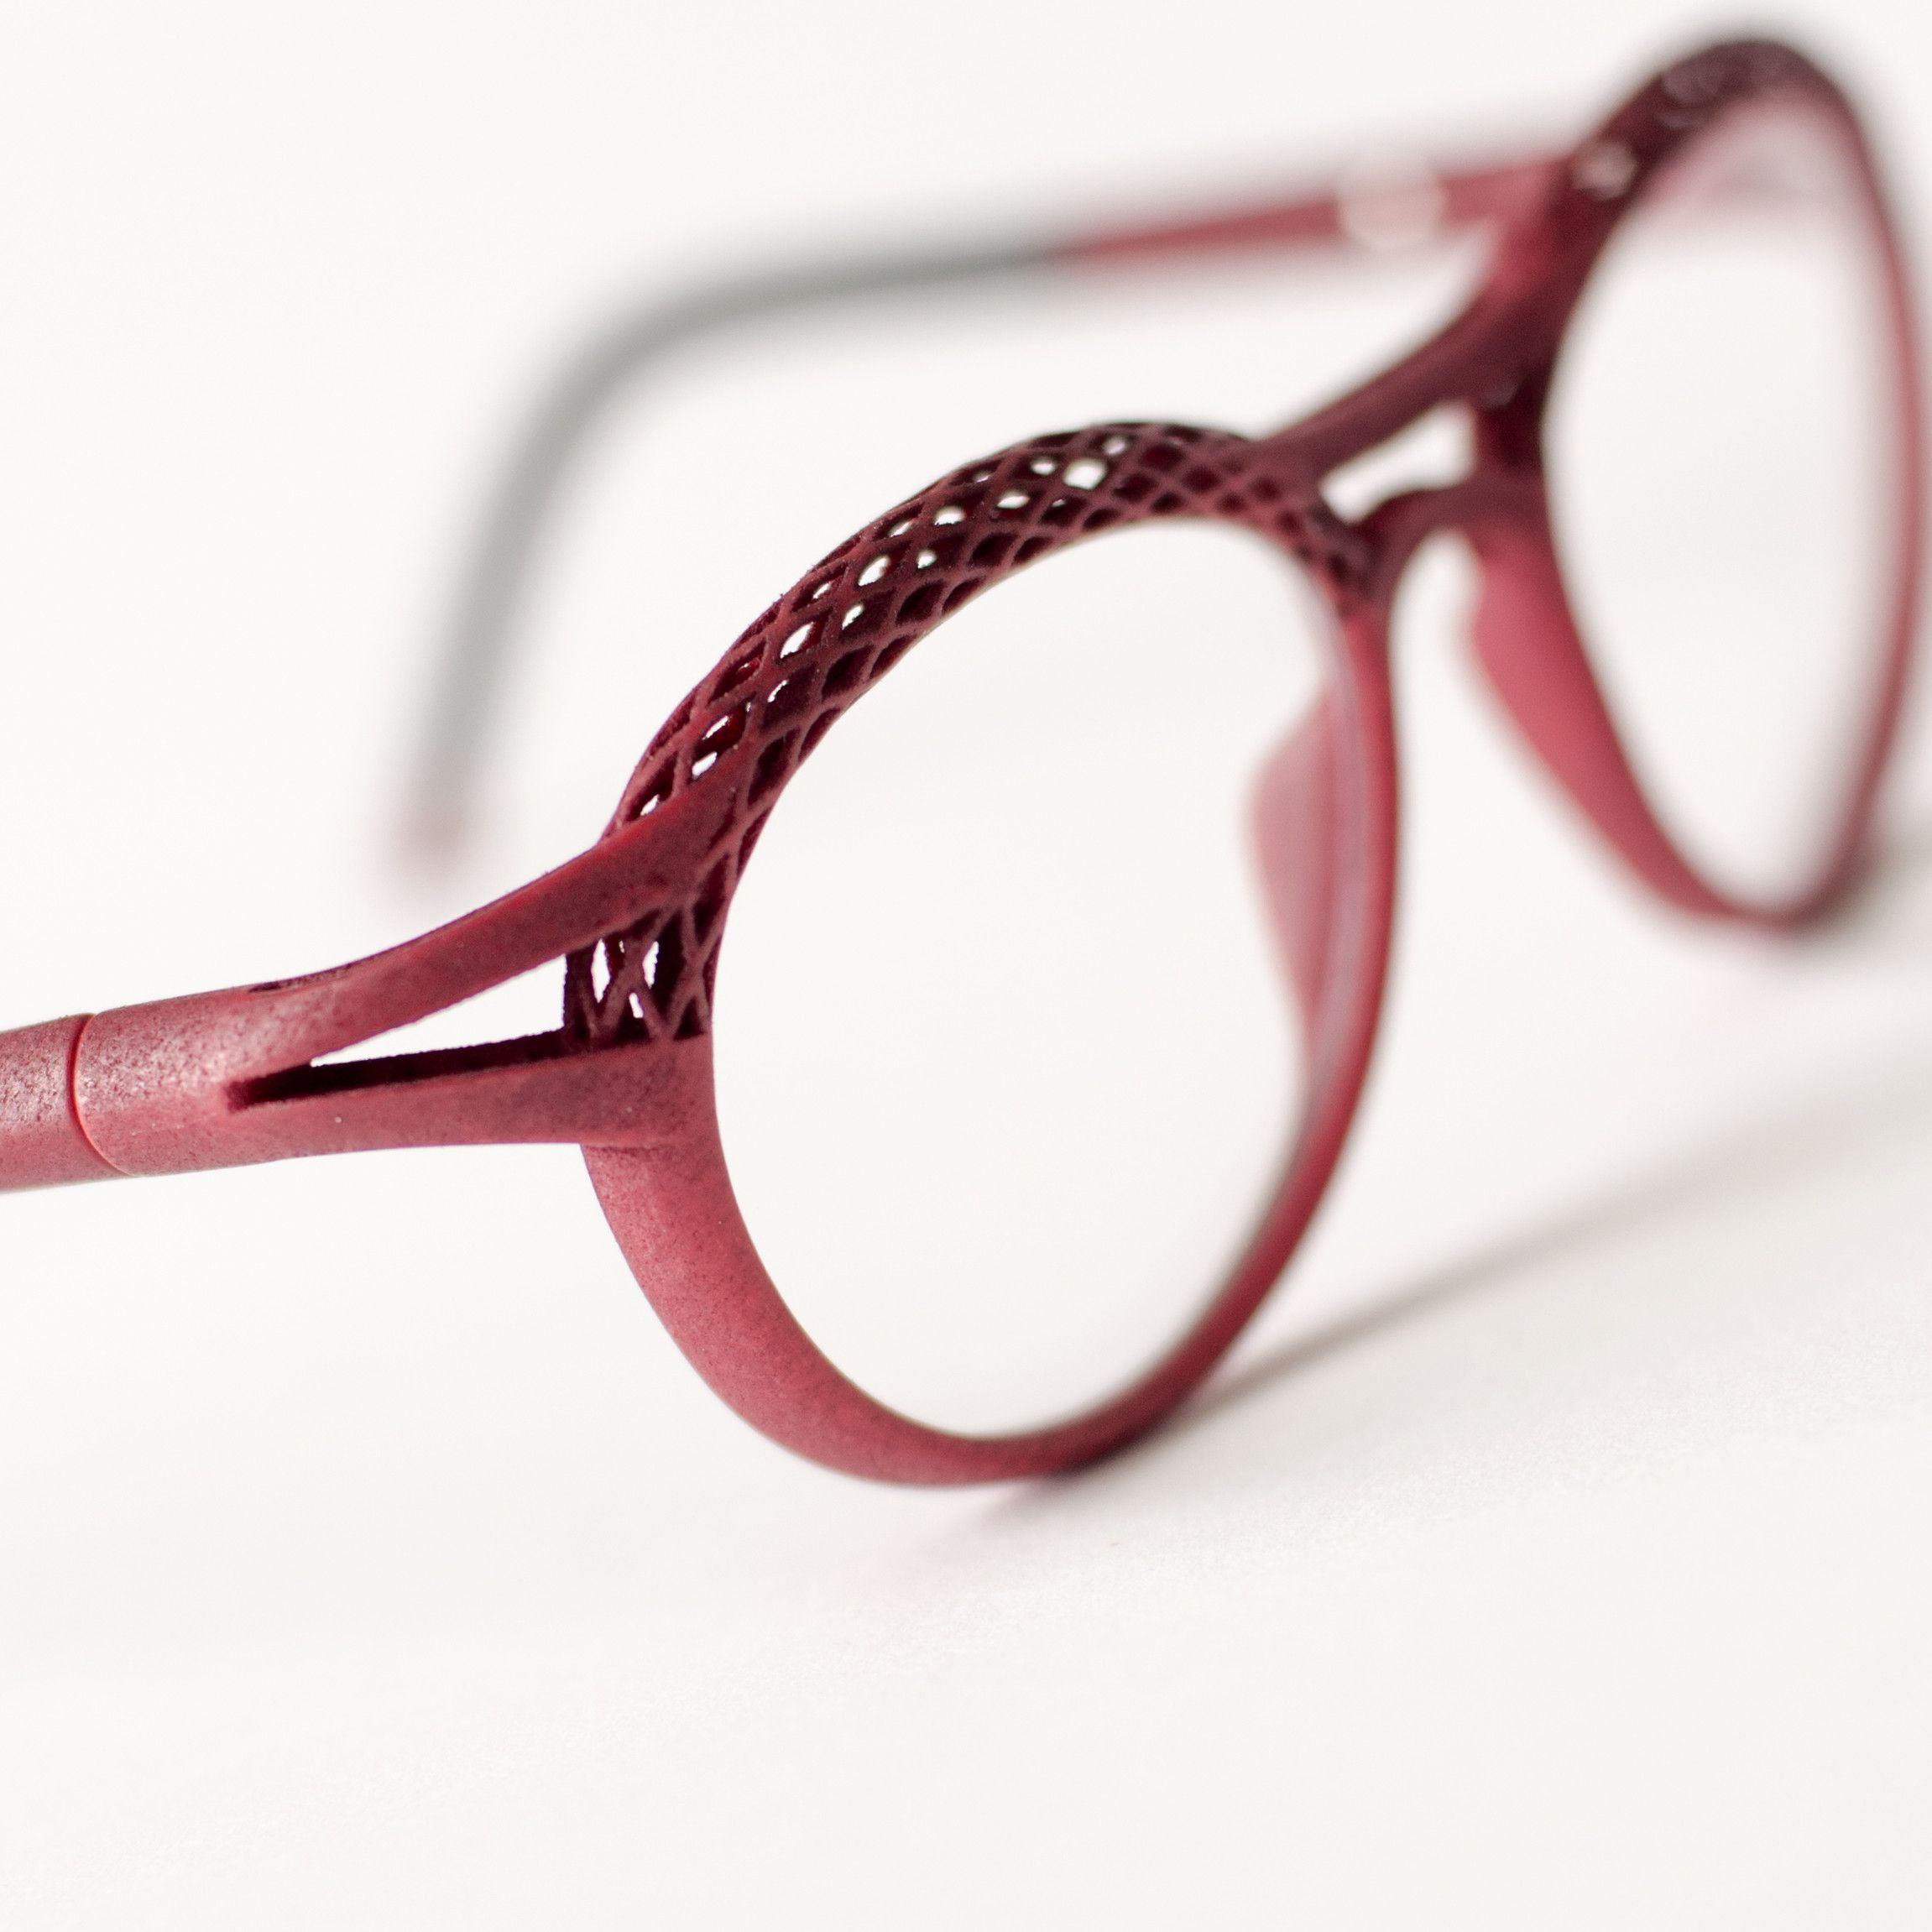 0d02f58469 18 Stunning Maui Jim Sunglasses Costco Smart Ideas - Maui Jim ...